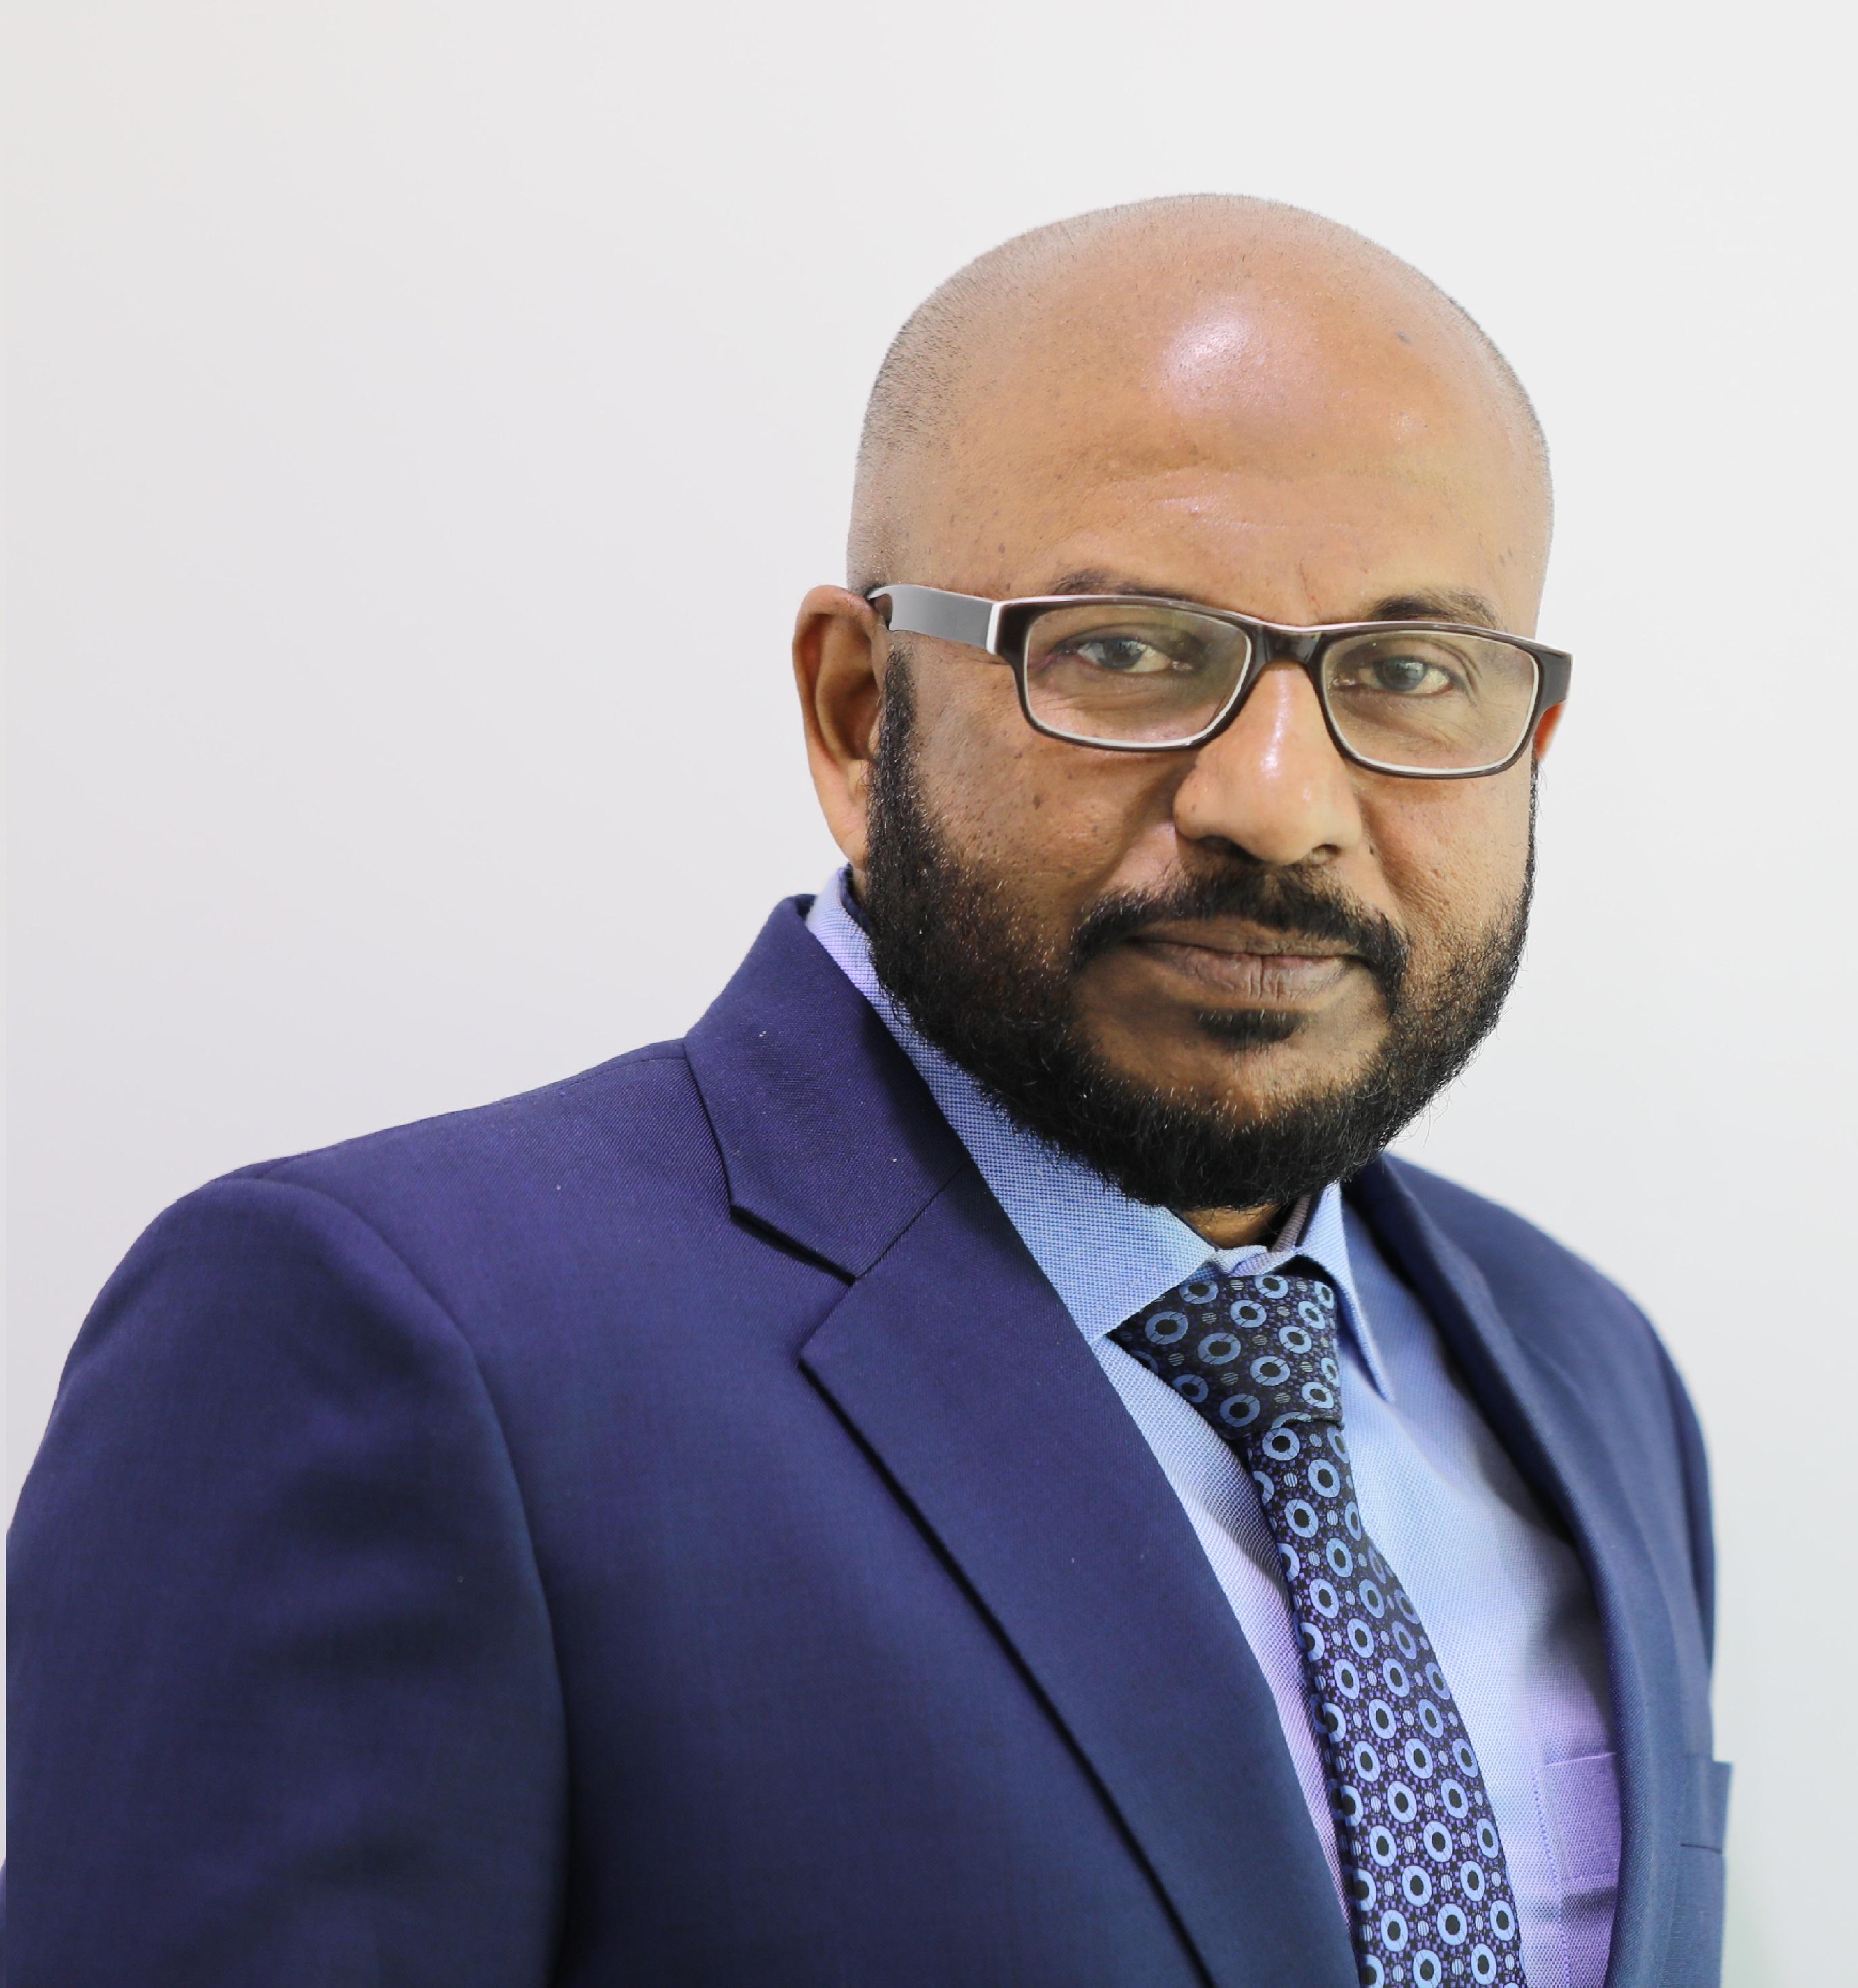 Mohammed Shoukat Ali